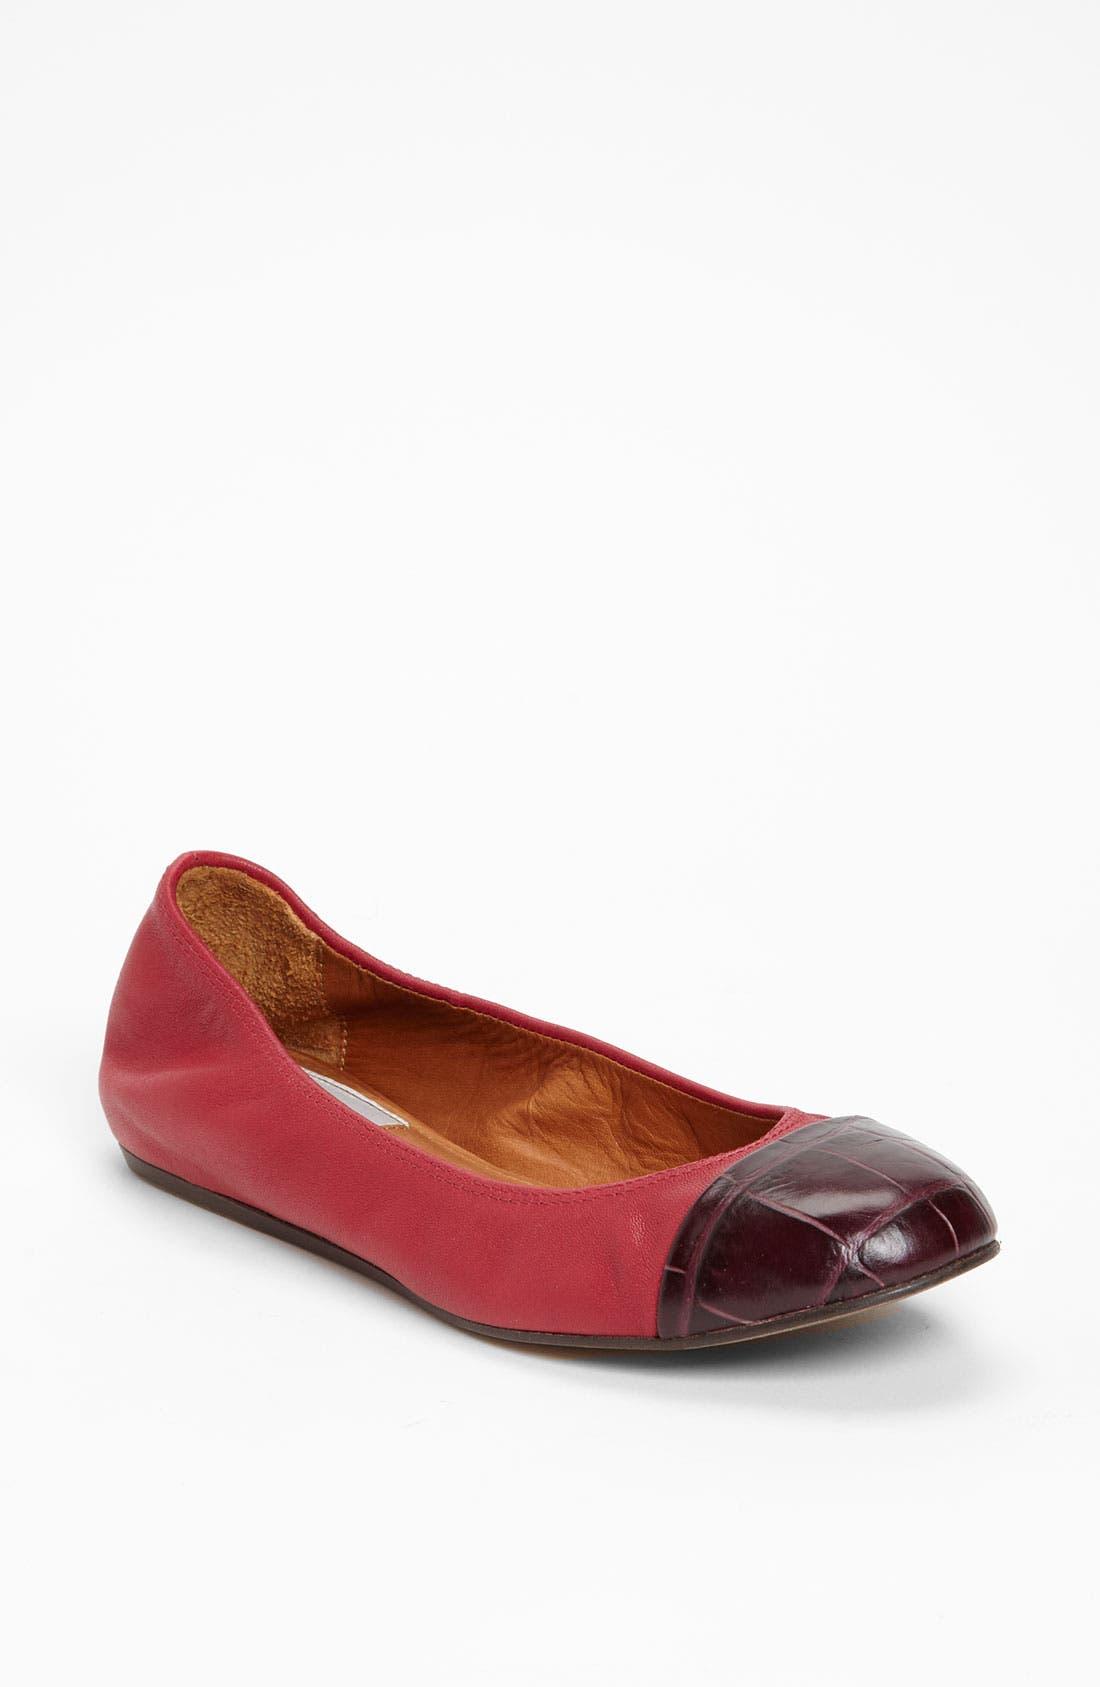 Alternate Image 1 Selected - Lanvin Cap Toe Ballerina Flat